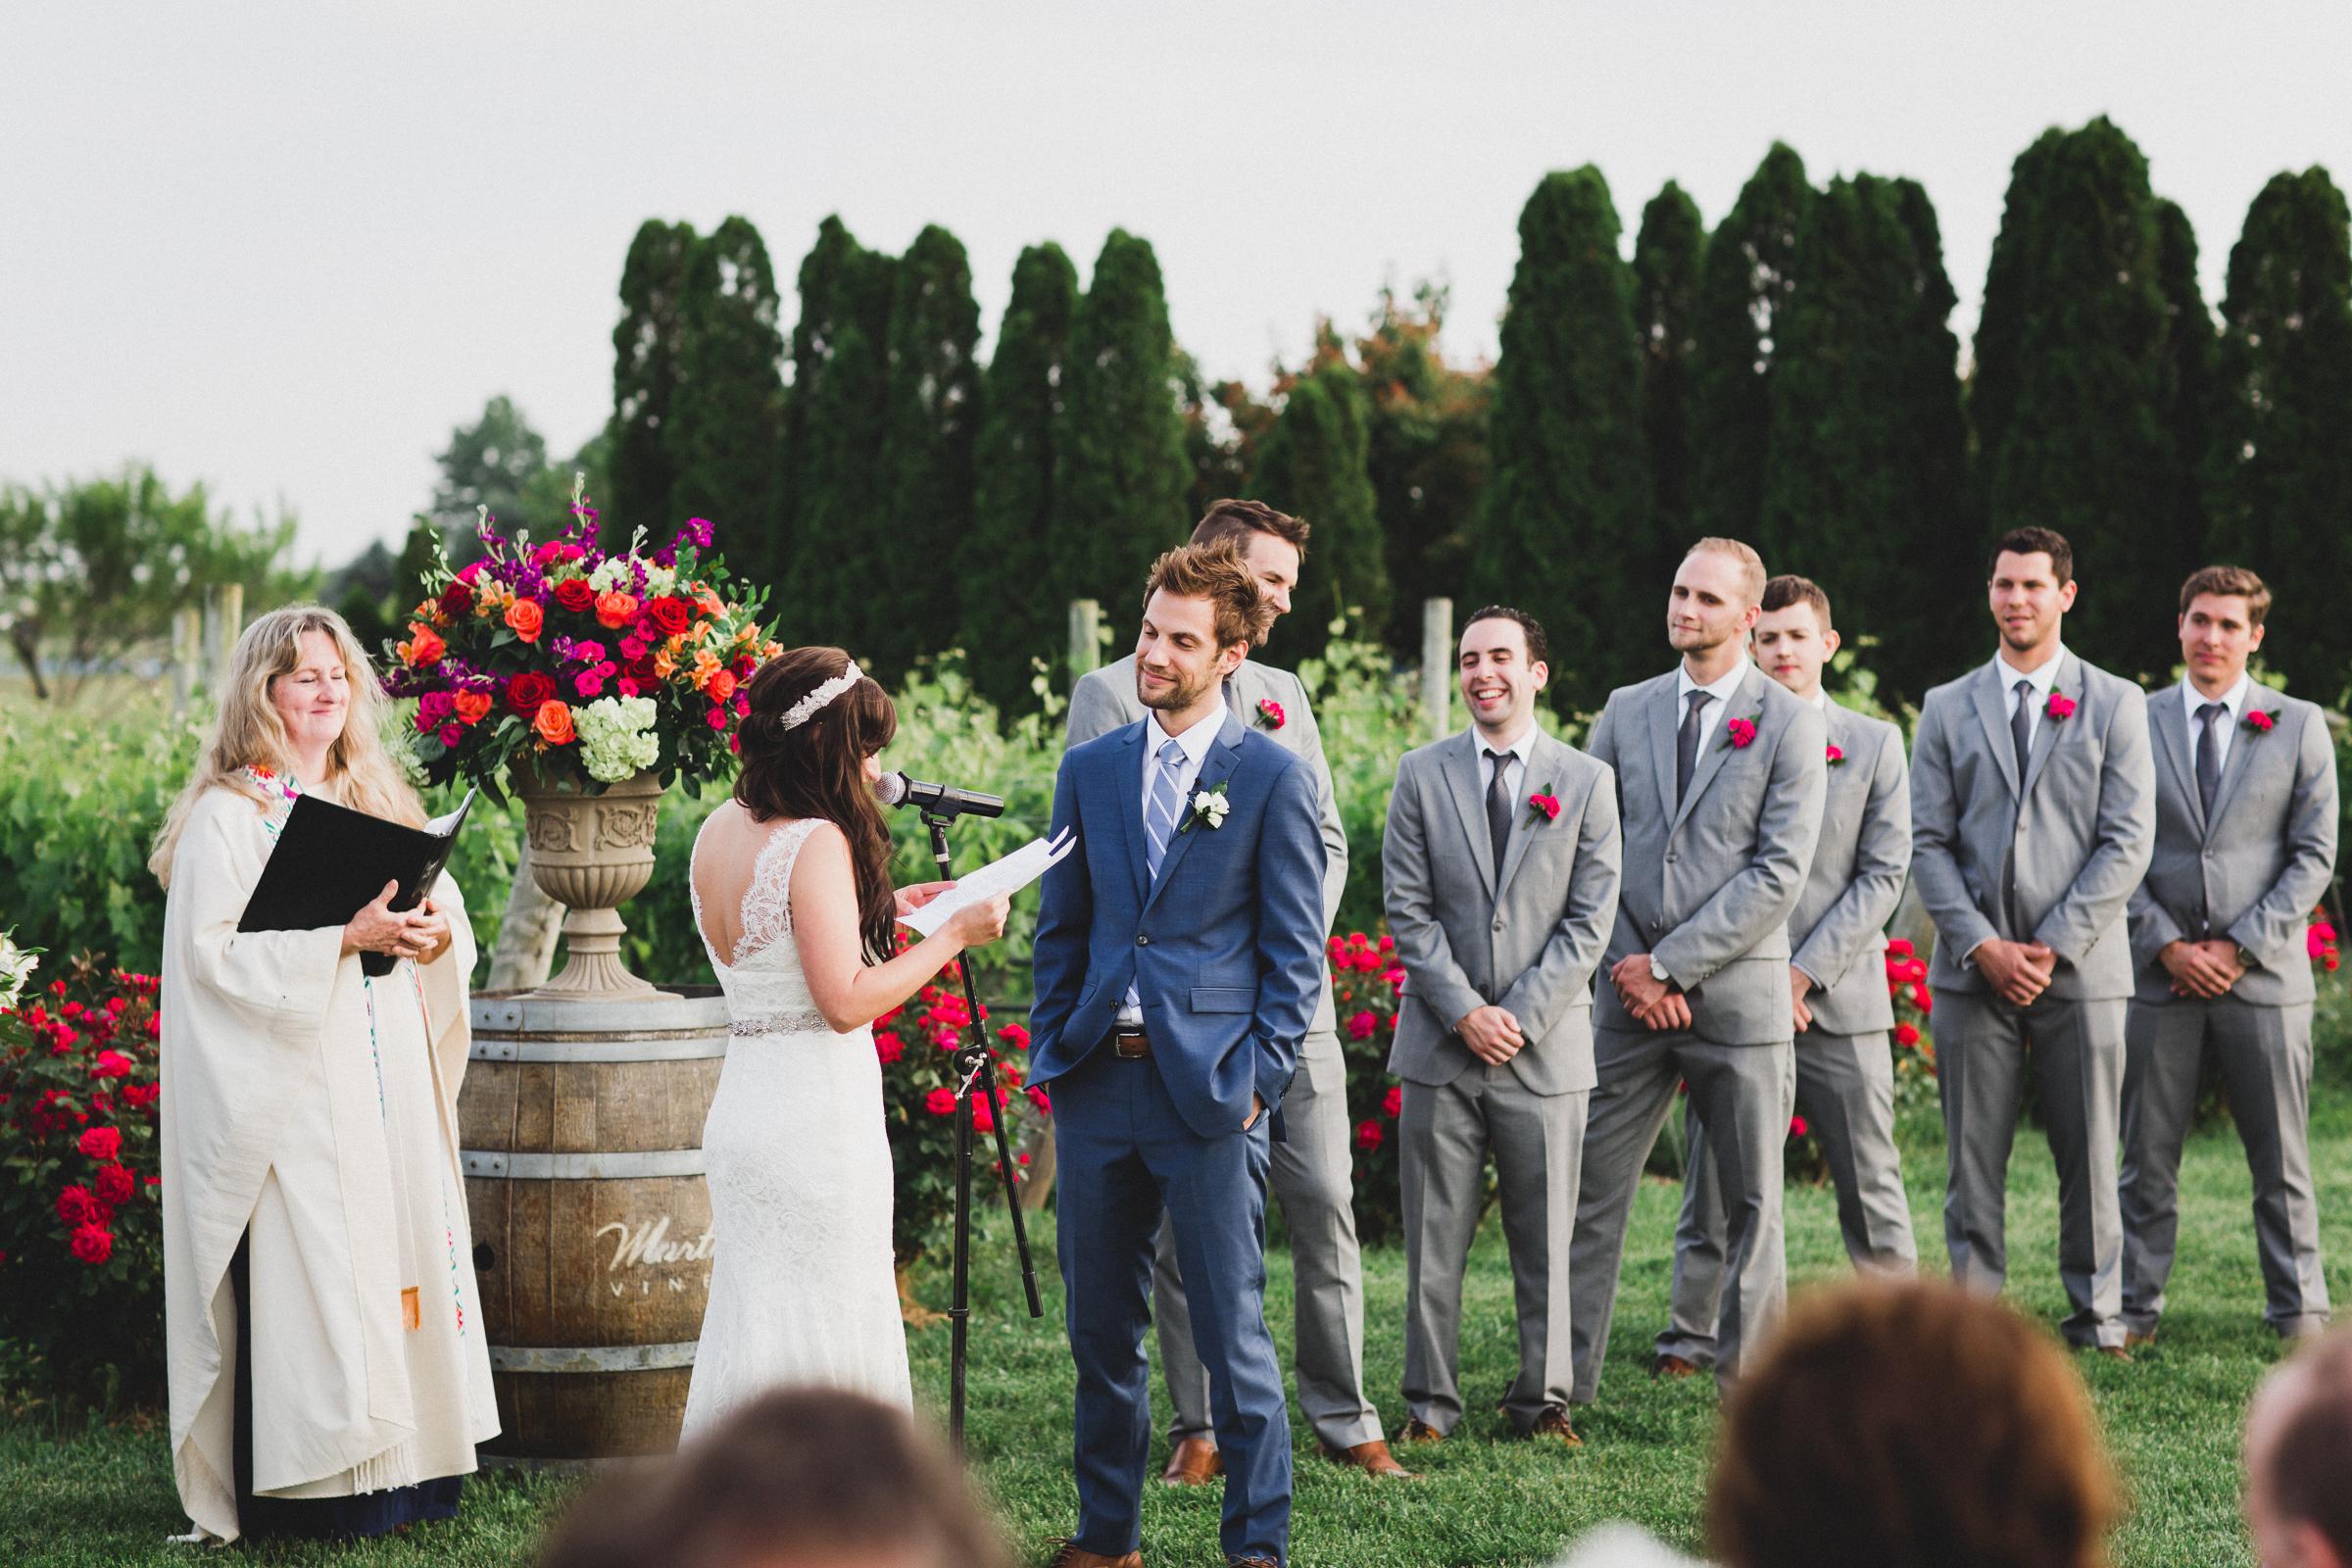 Martha-Clara-Vineyard-Long-Island-Documentary-Wedding-Photographer-56.jpg